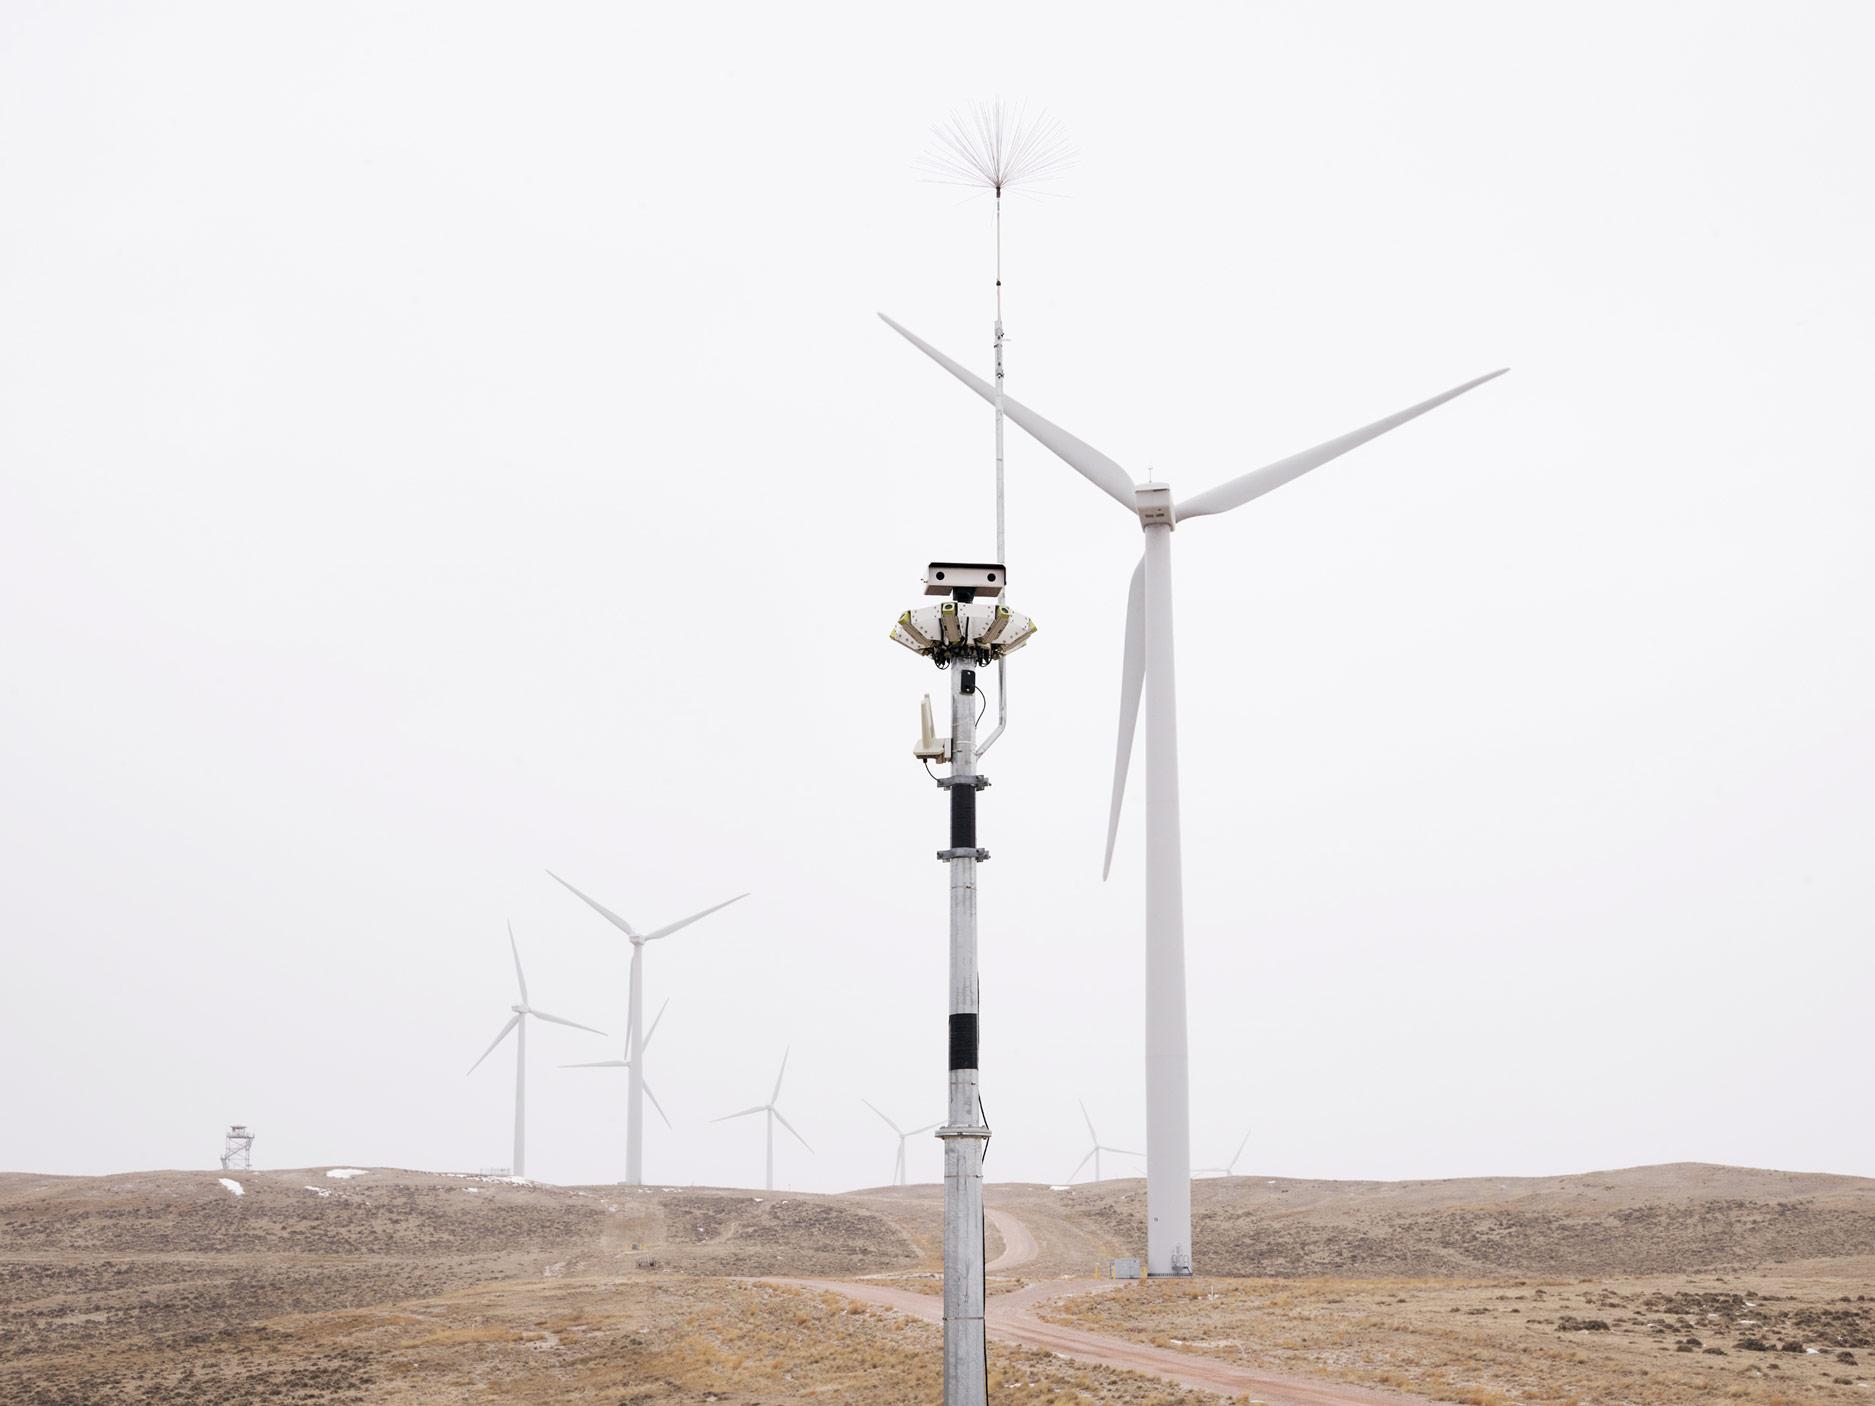 IdentiFlight Raptor Scanner, Top of the World Wind Farm, Casper, Wyoming, 2018